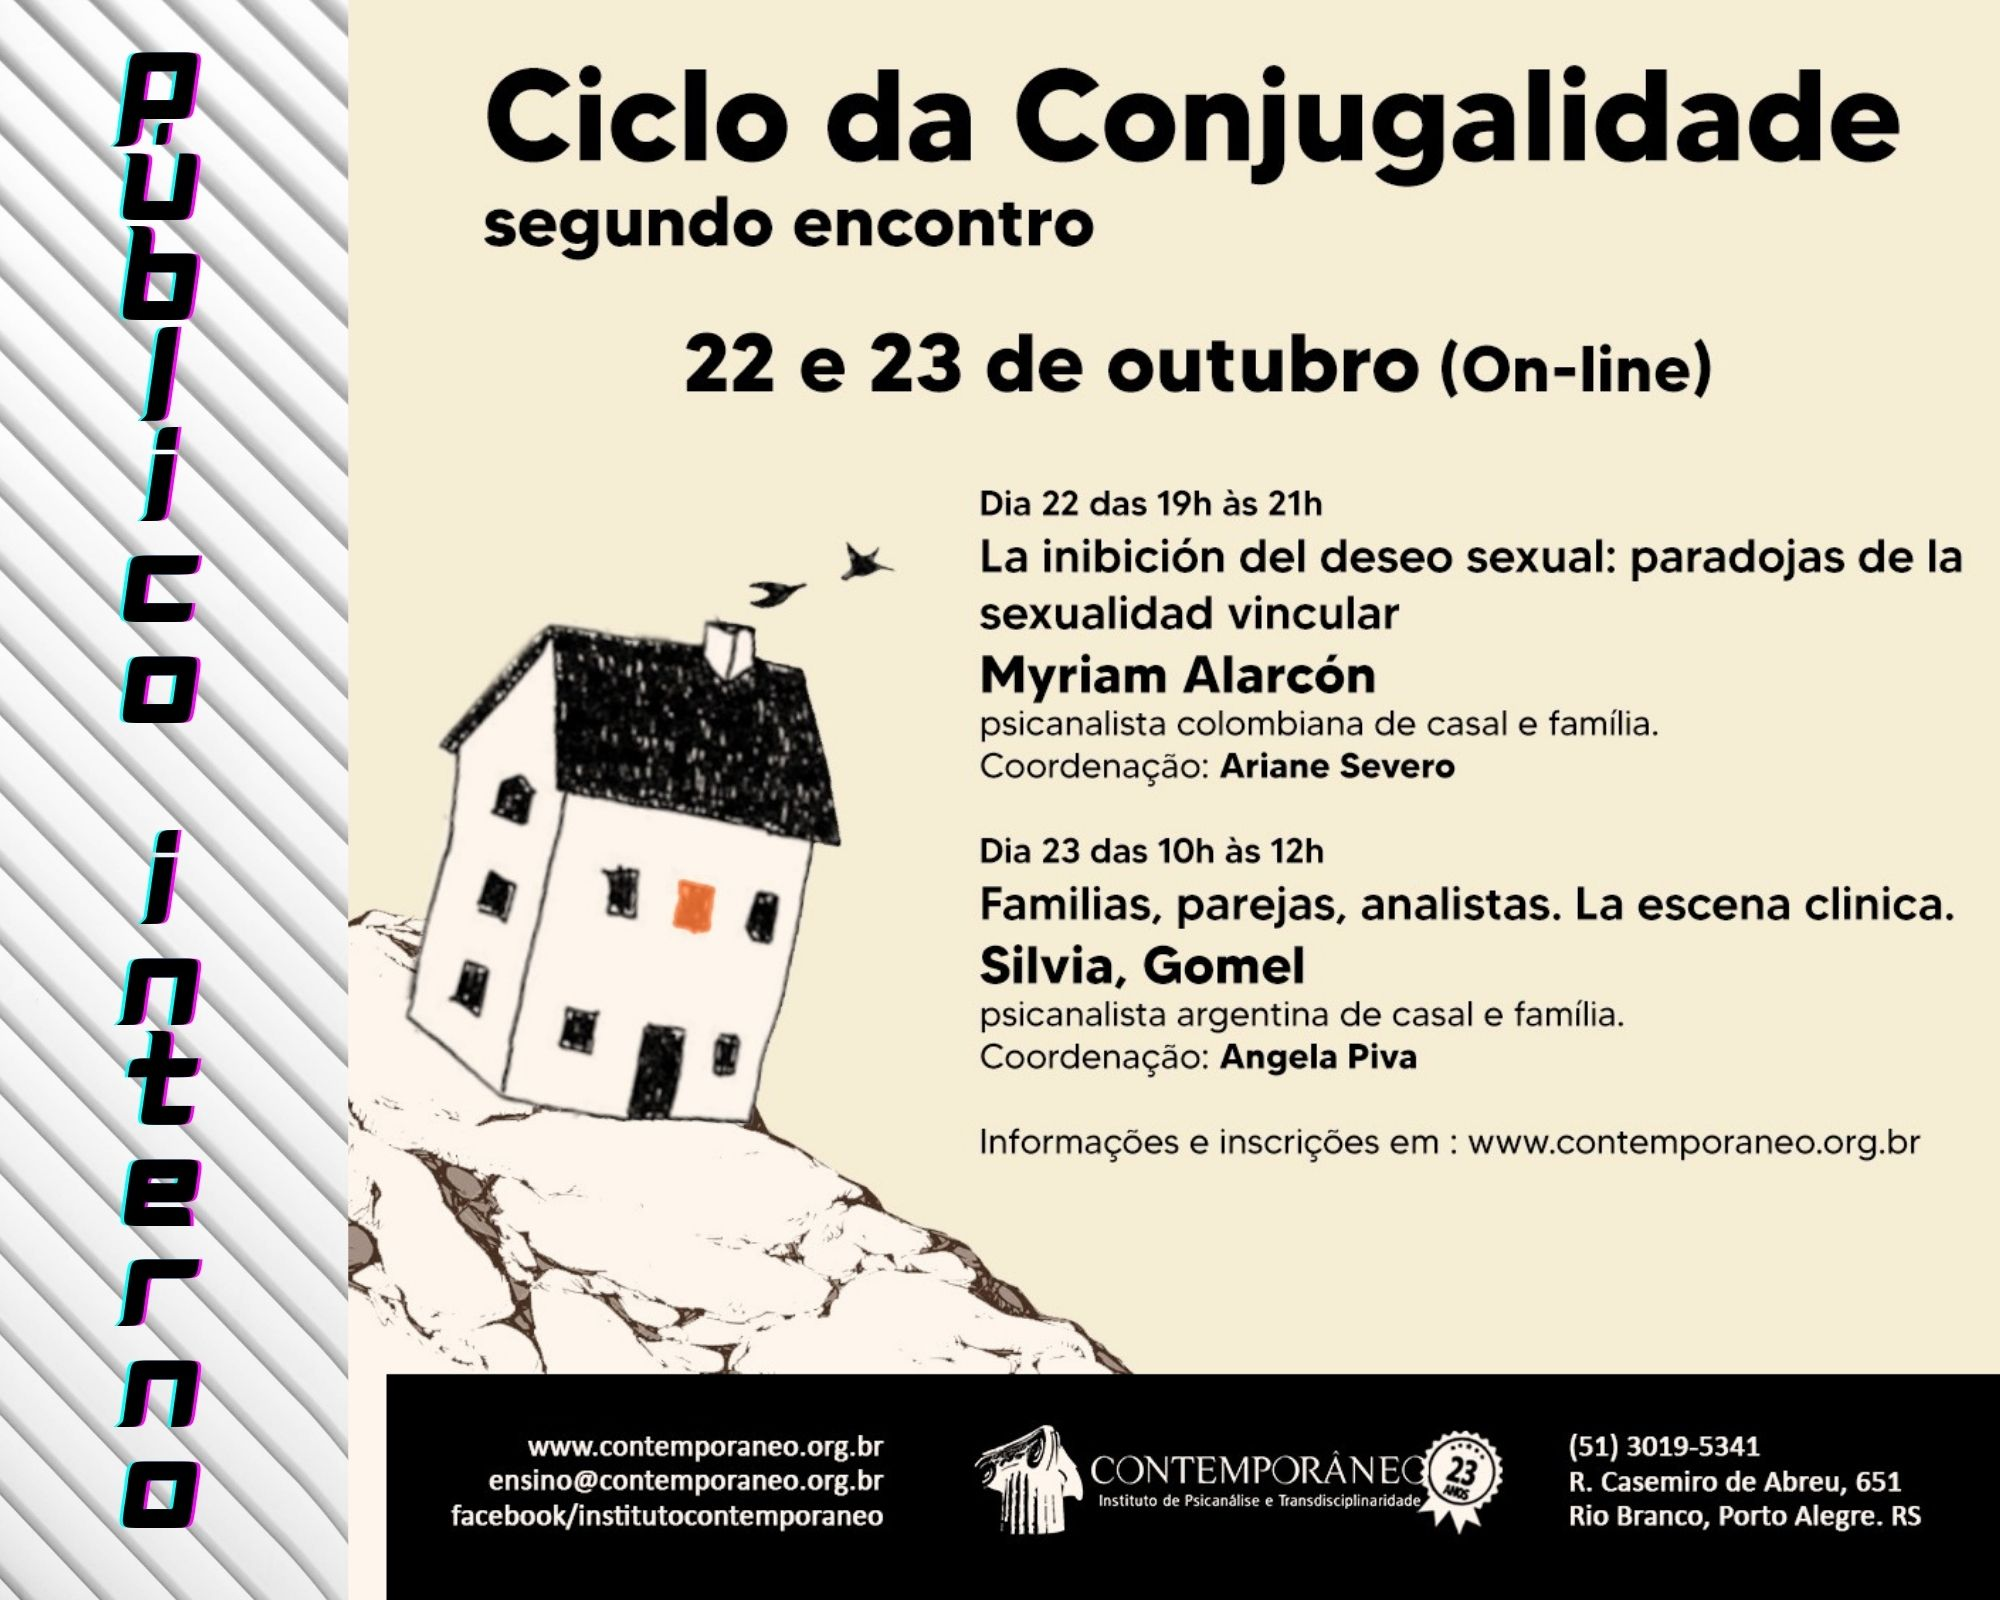 Curso para Ciclo da Conjugalidade 2º Encontro - Público Interno